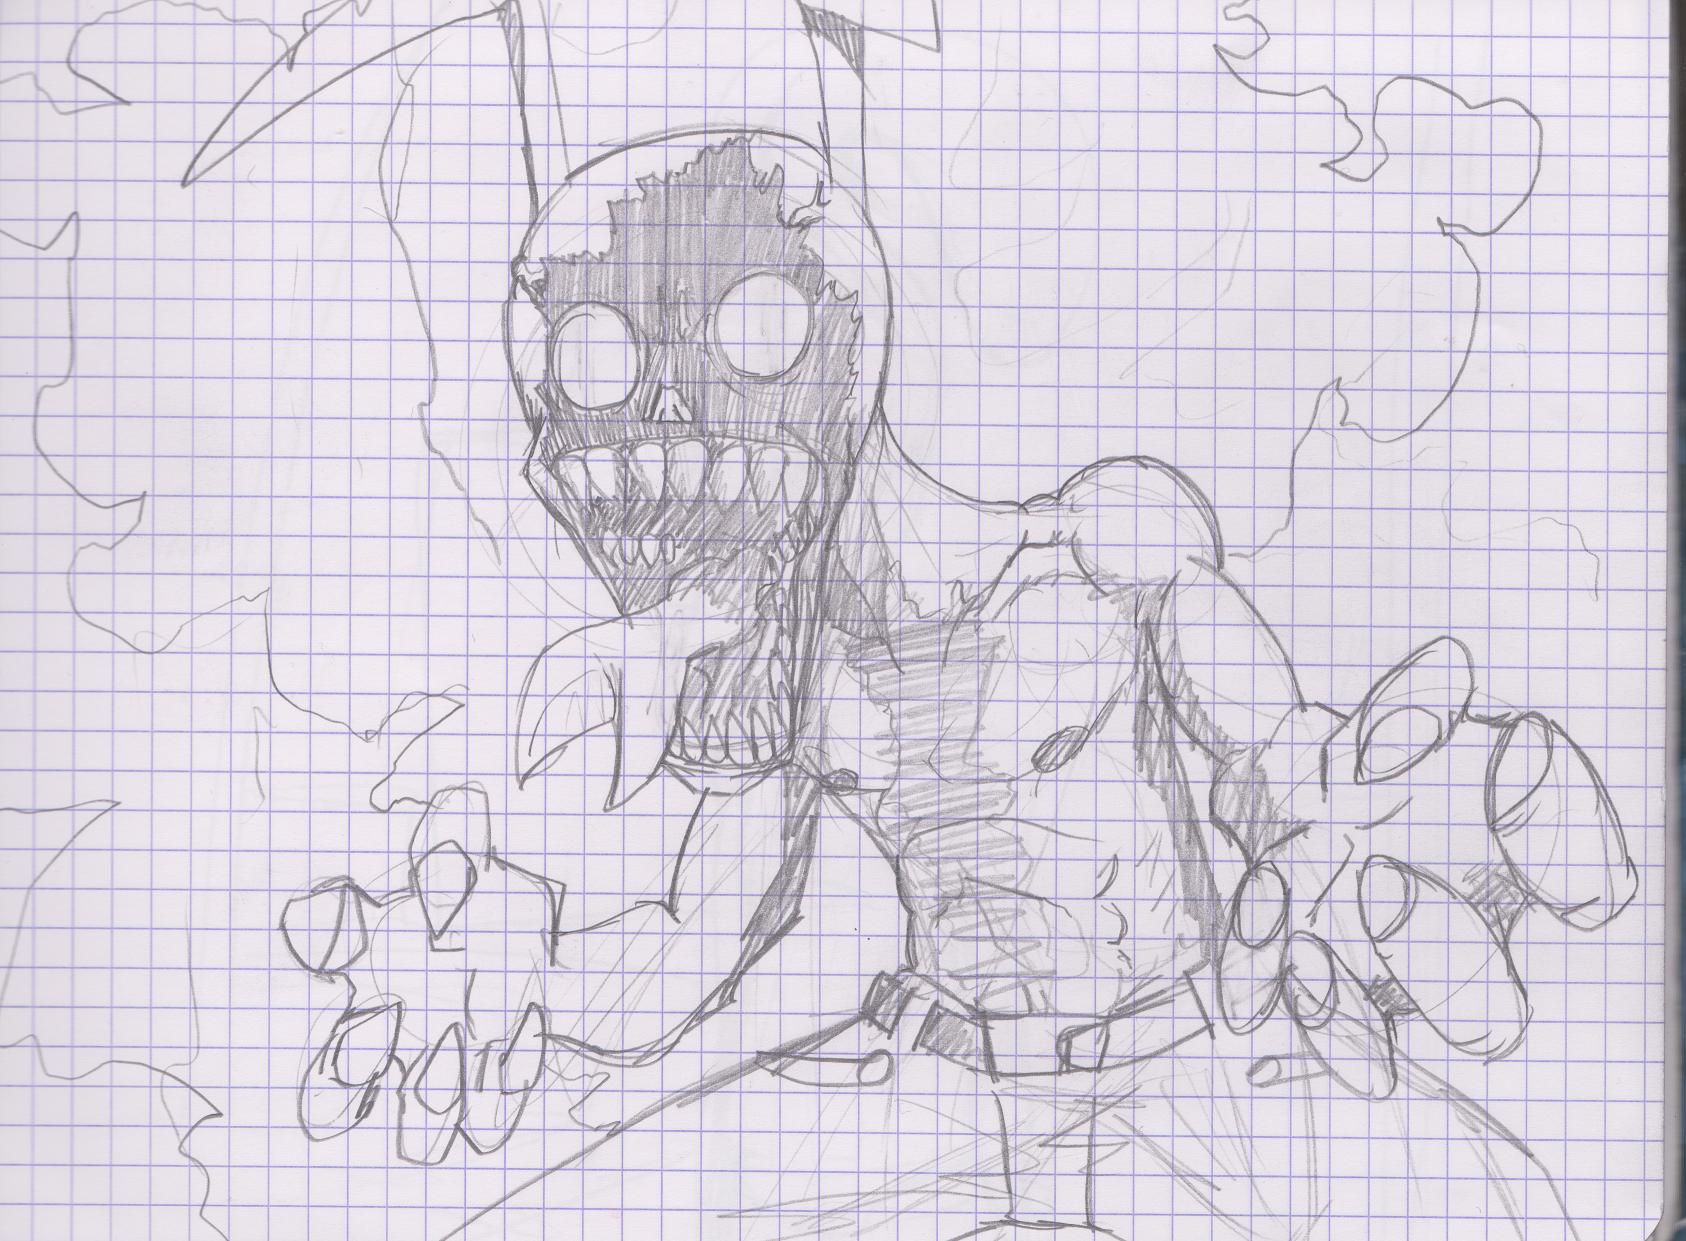 SH sketchbook page 66